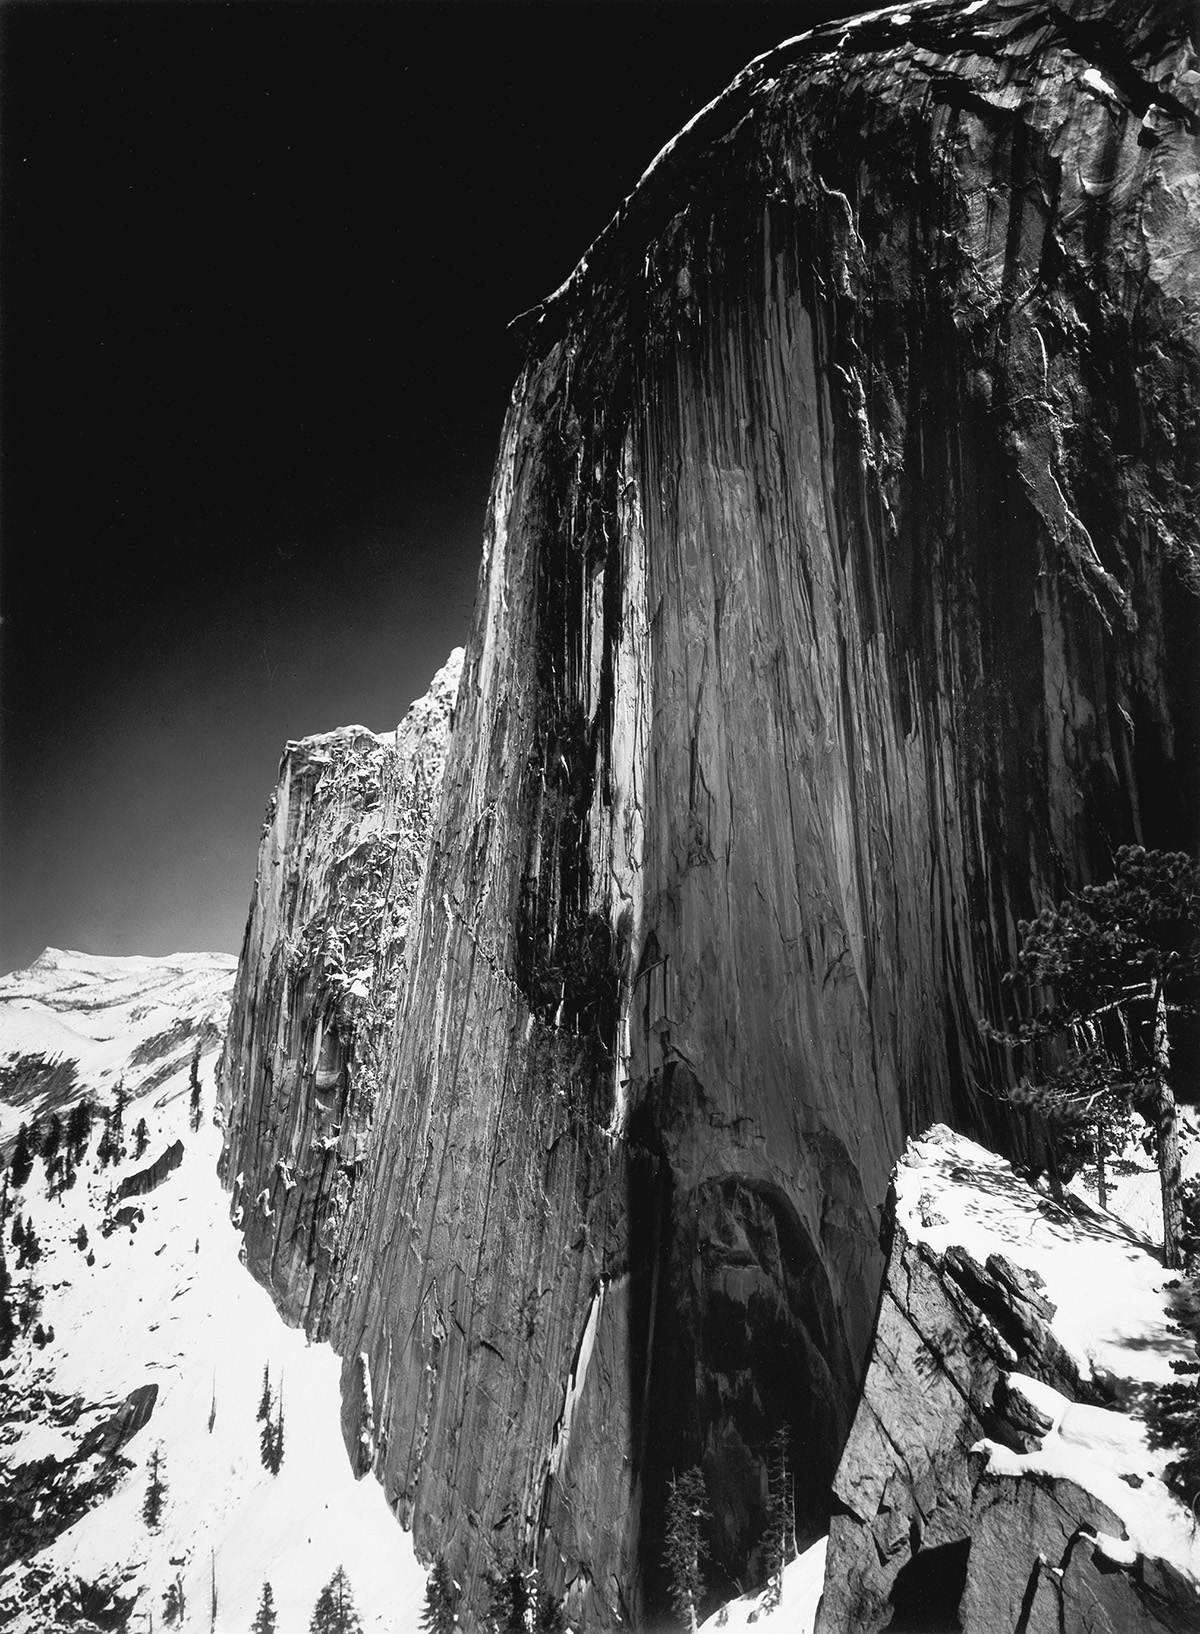 ANSEL-ADAMS-(1902-1984)-Monolith-the-Face-of-Half-Dome